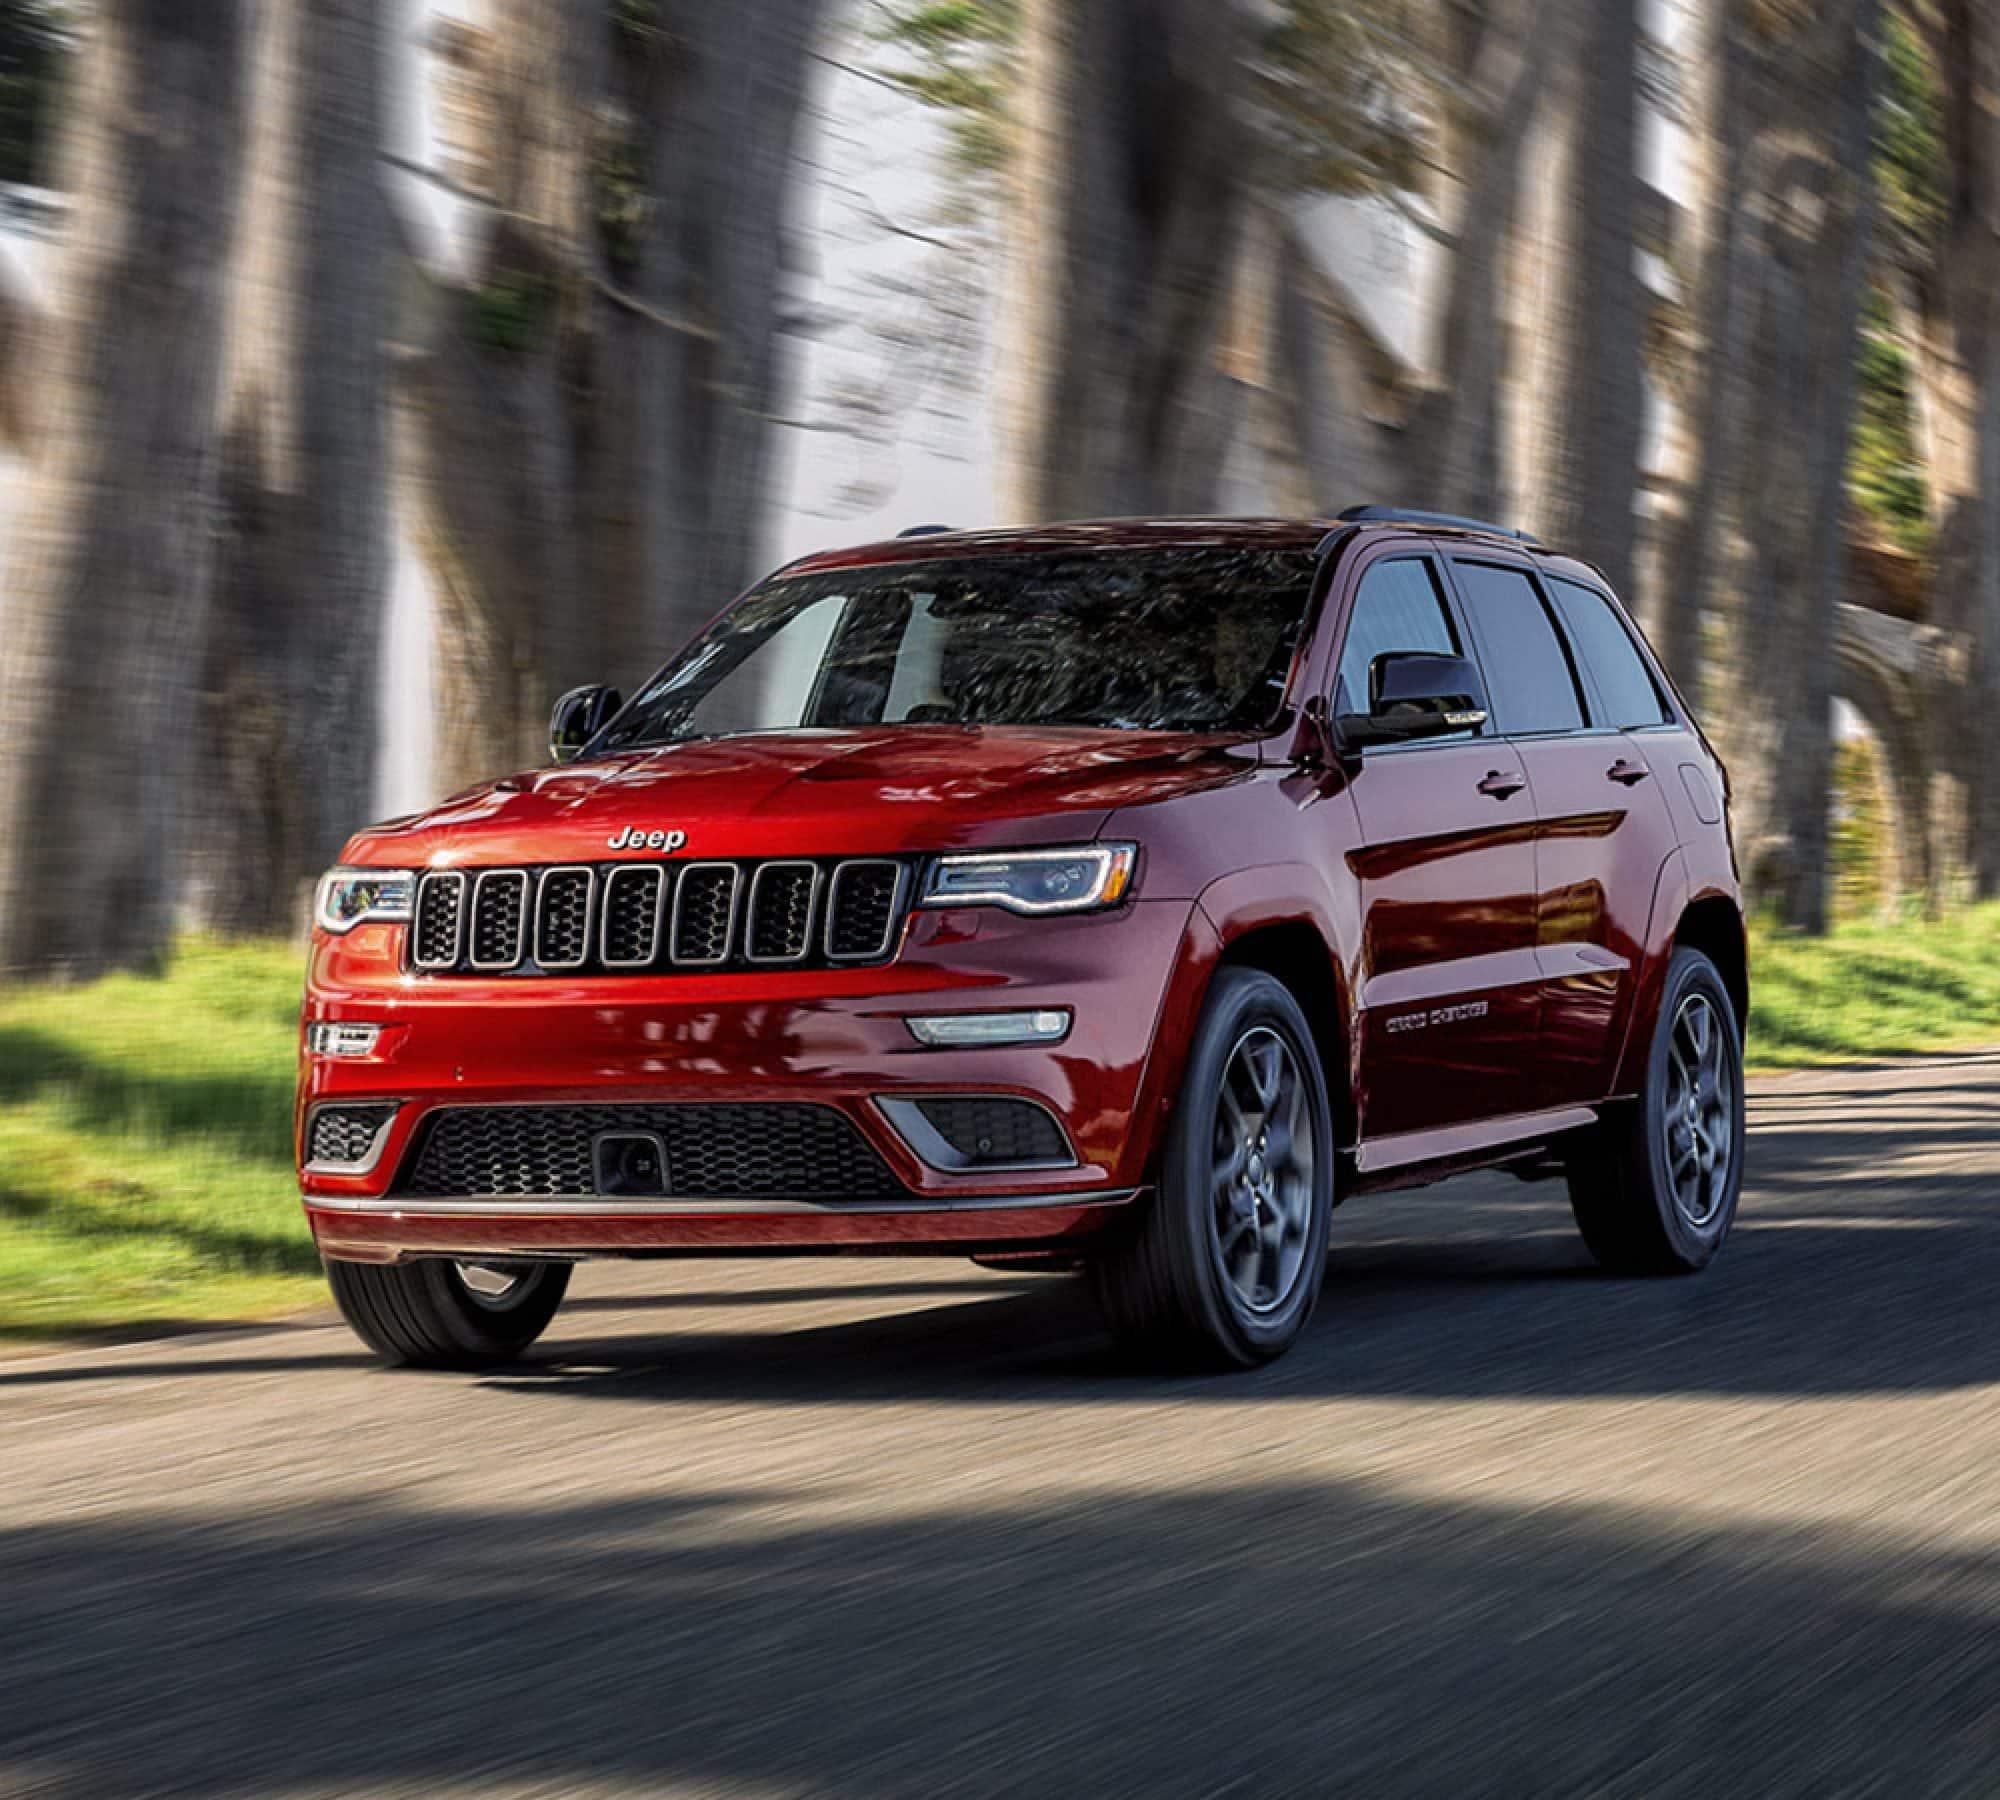 2020 Jeep Grand Cherokee First Drive